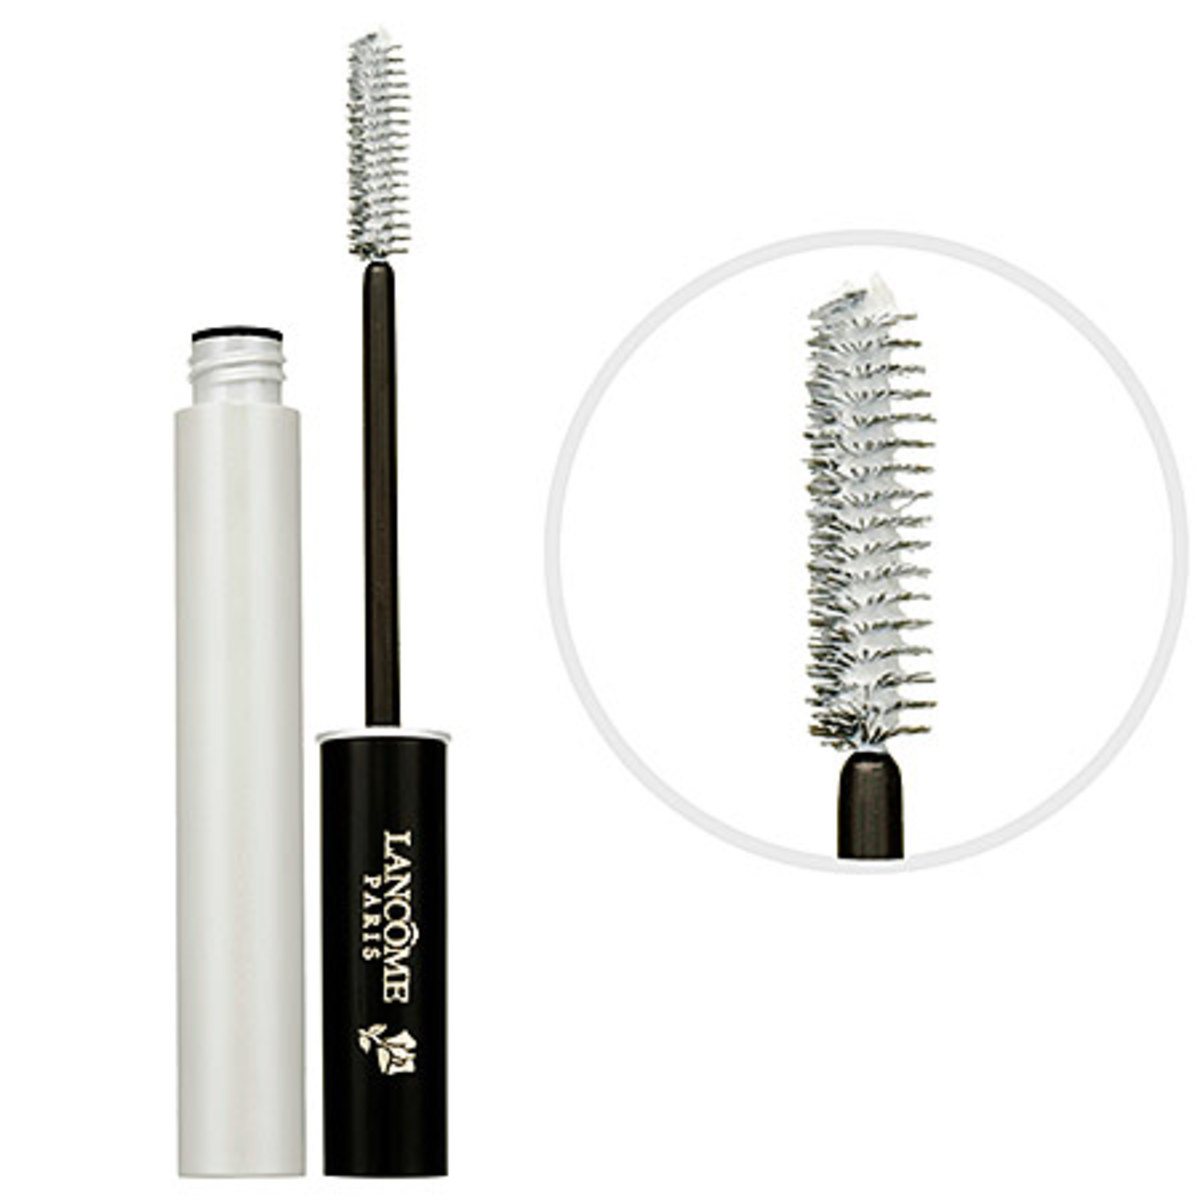 Lancome Cils Booster XL Super-Enhancing Mascara Base